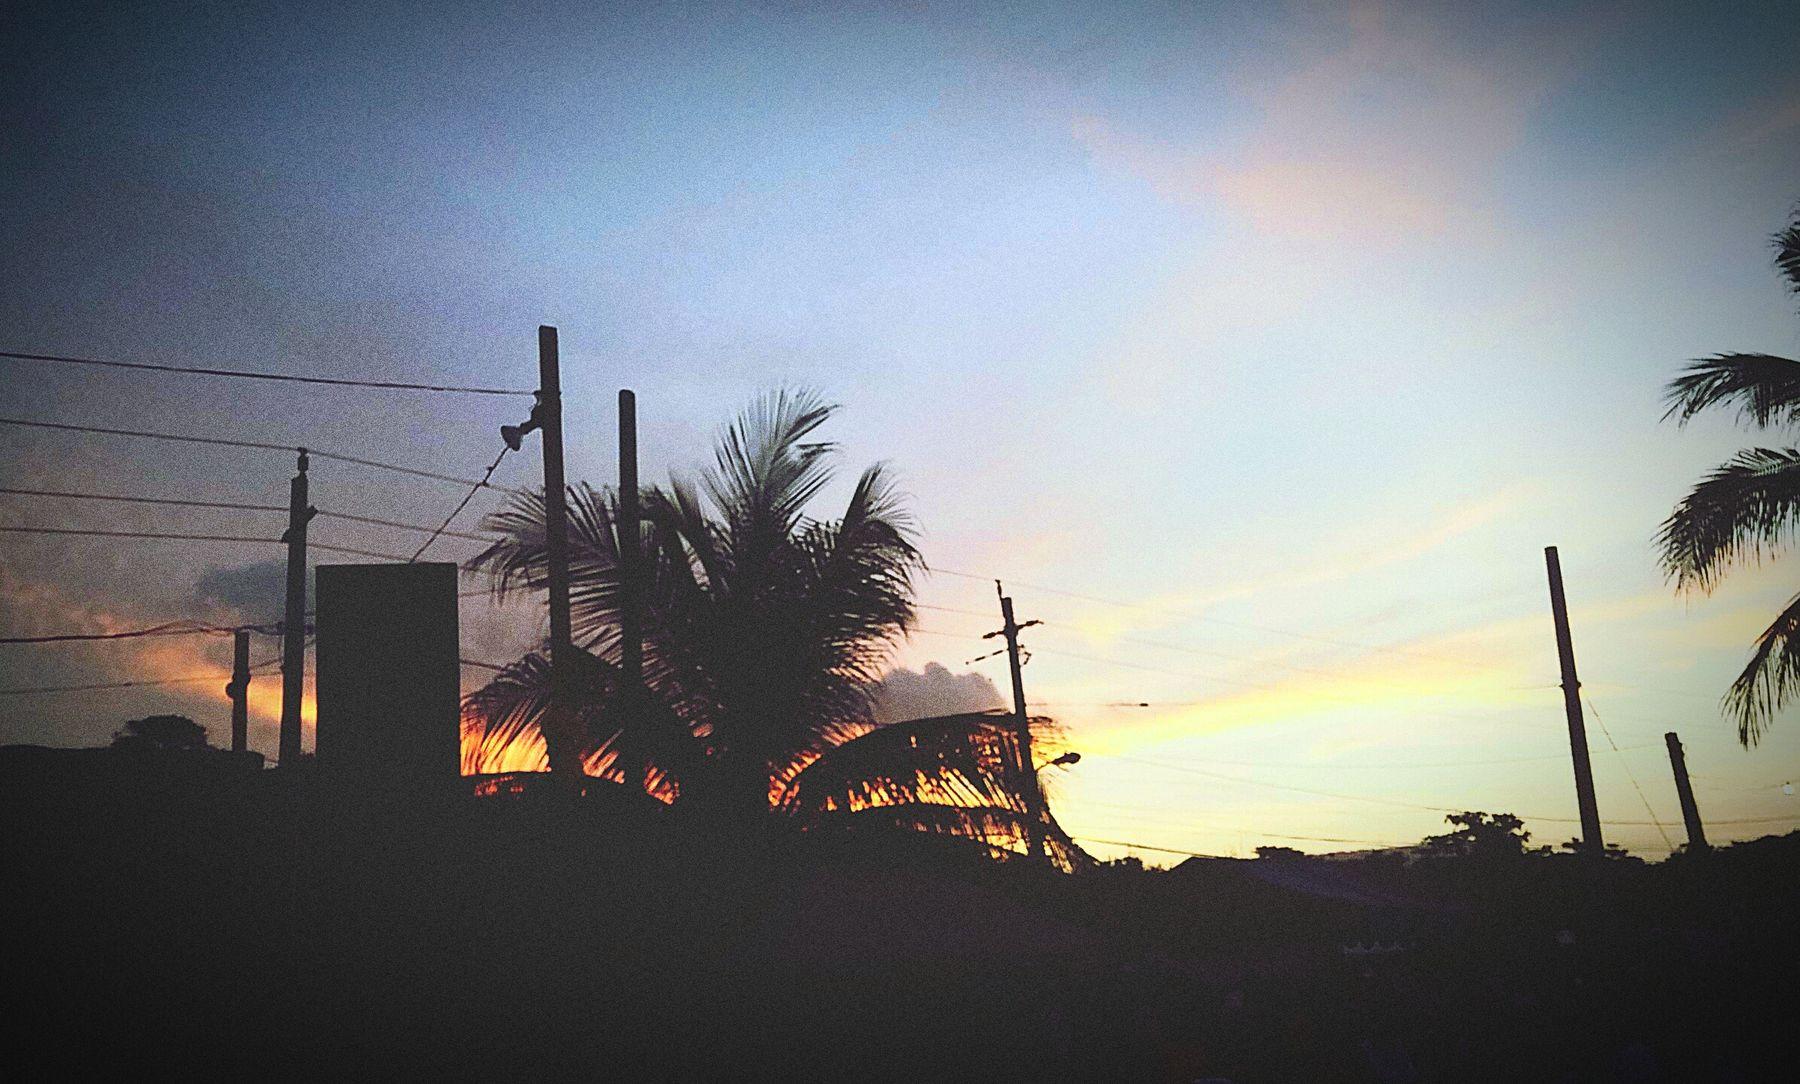 Long Bay Gala 2015. Enjoying the Cool Summer Evening. Sunshine Enjoying The Sun Enjoying The Sun